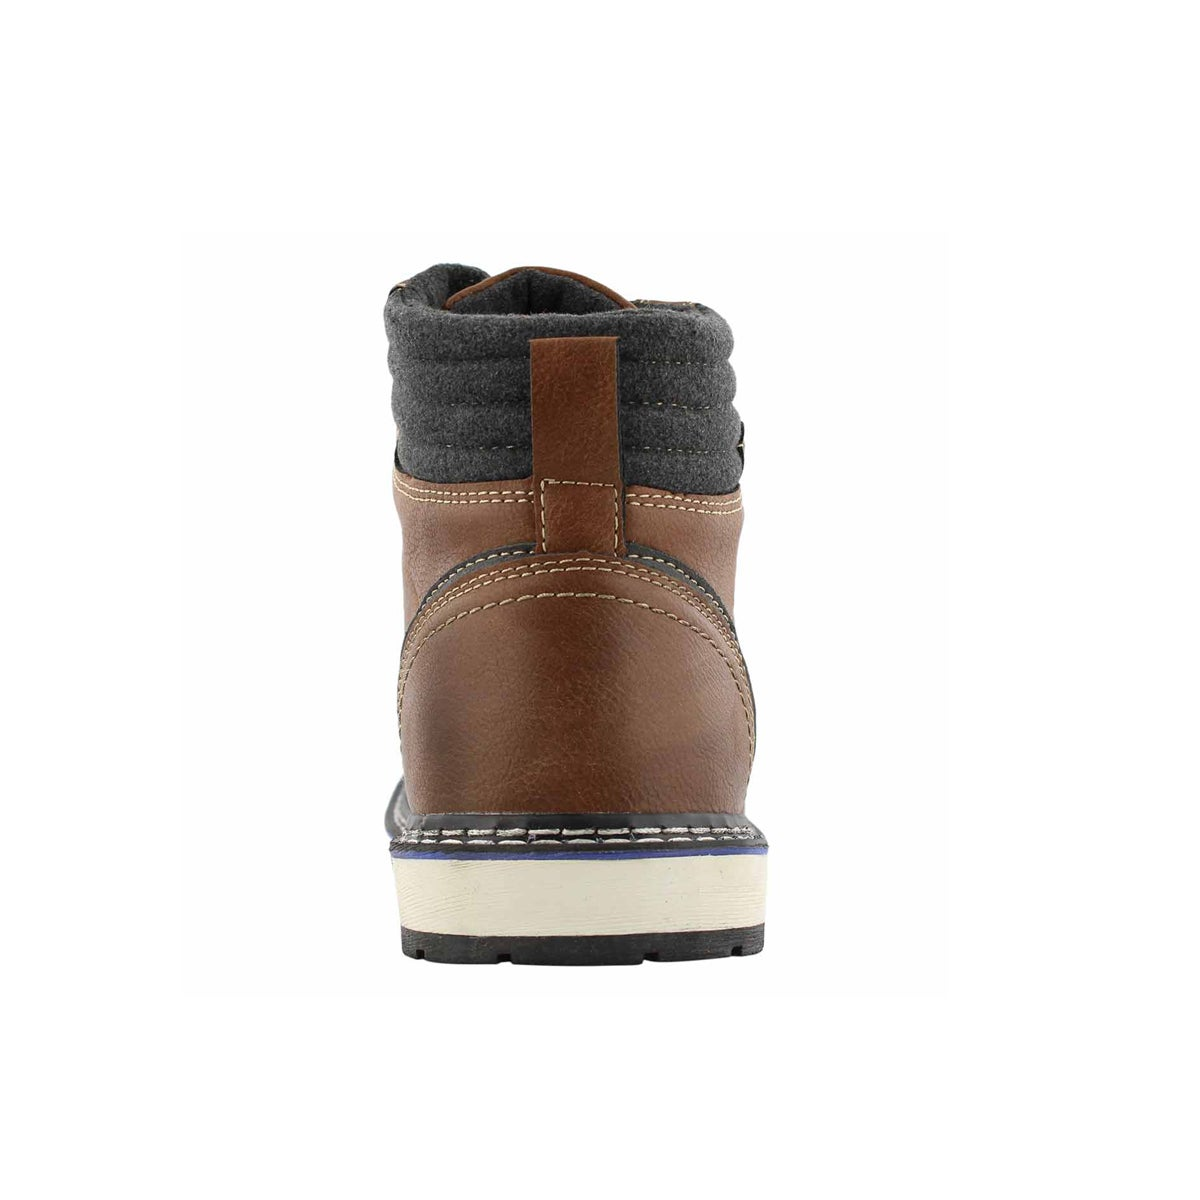 Mns Ballard cgnc lace up ankle boot